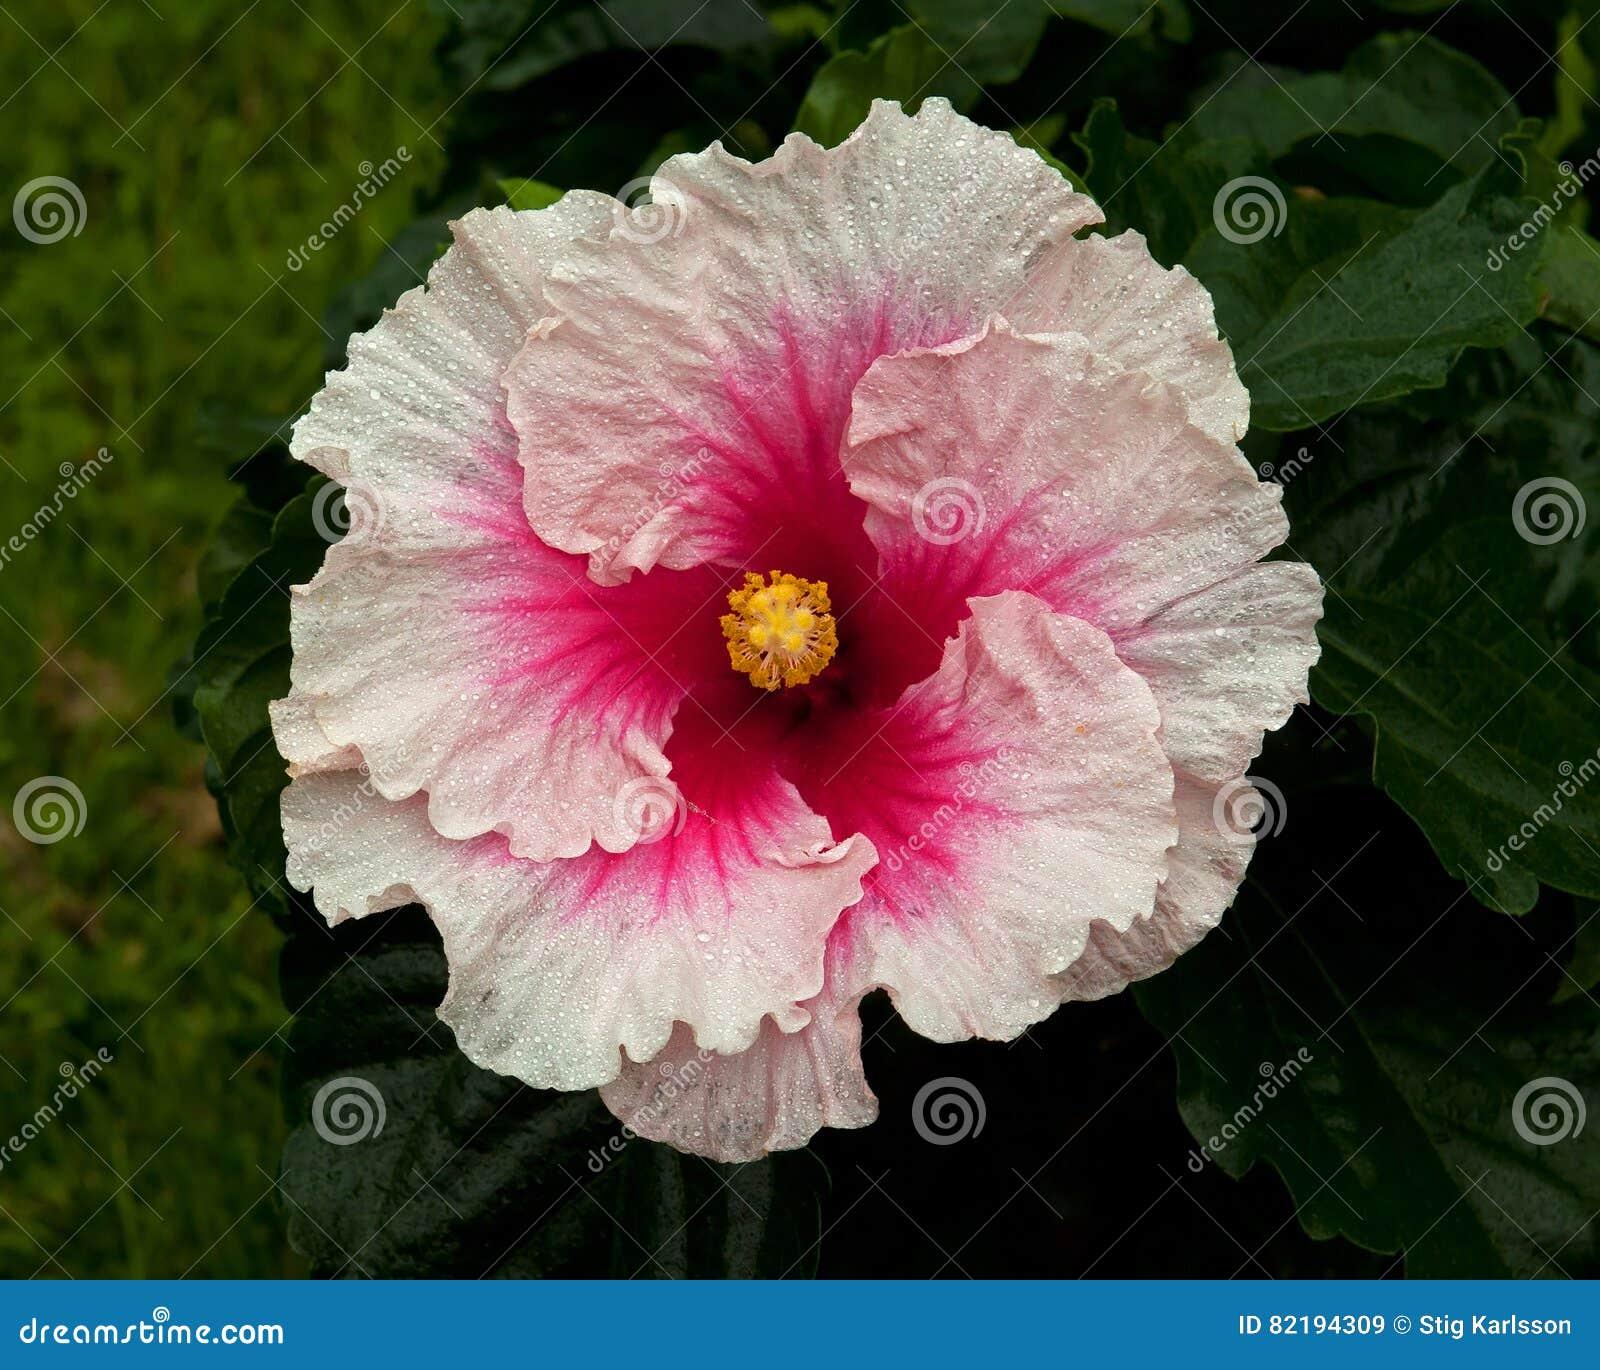 Hibiscus hawaiirose rosa adonicus stock image image of macro royalty free stock photo izmirmasajfo